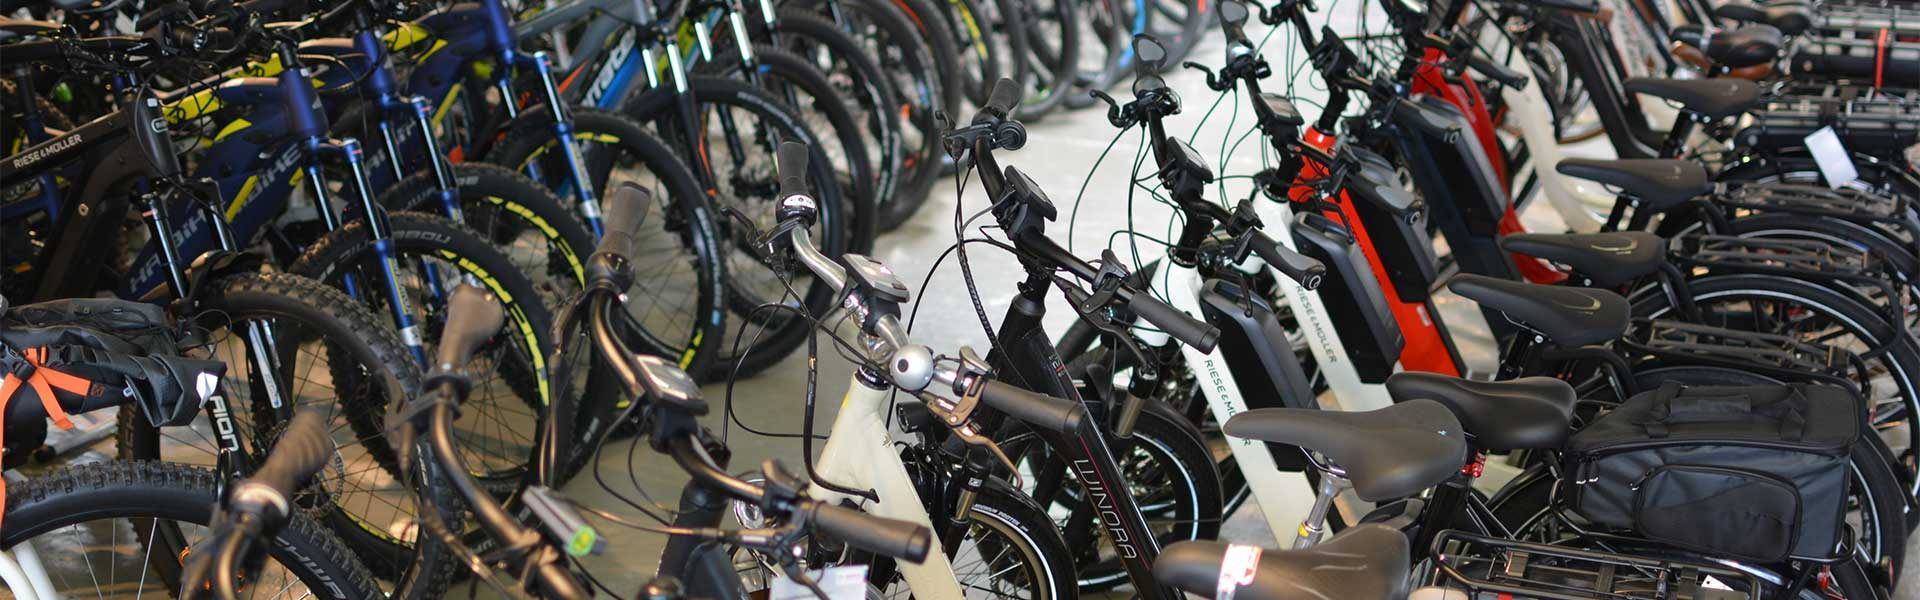 Der Shop der e-motion e-Bike Welt Saarbrücken